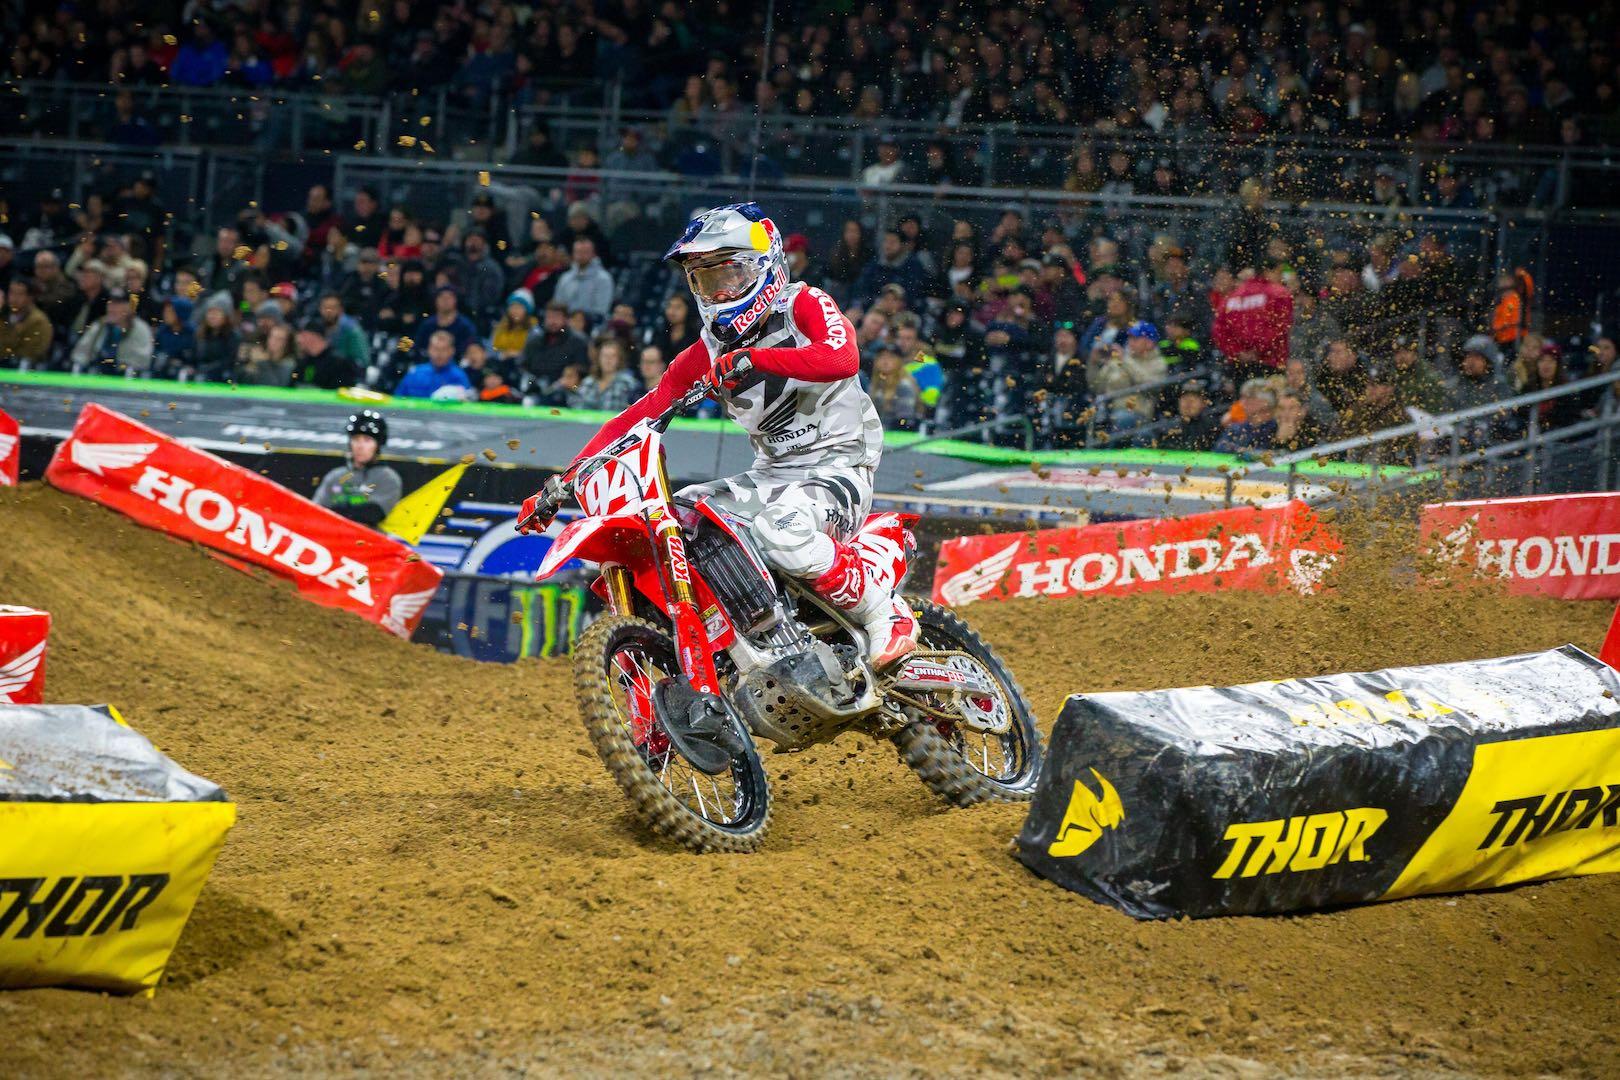 2017 Anaheim II Supercross Preview | Can Anyone Stop Honda's Roczen?